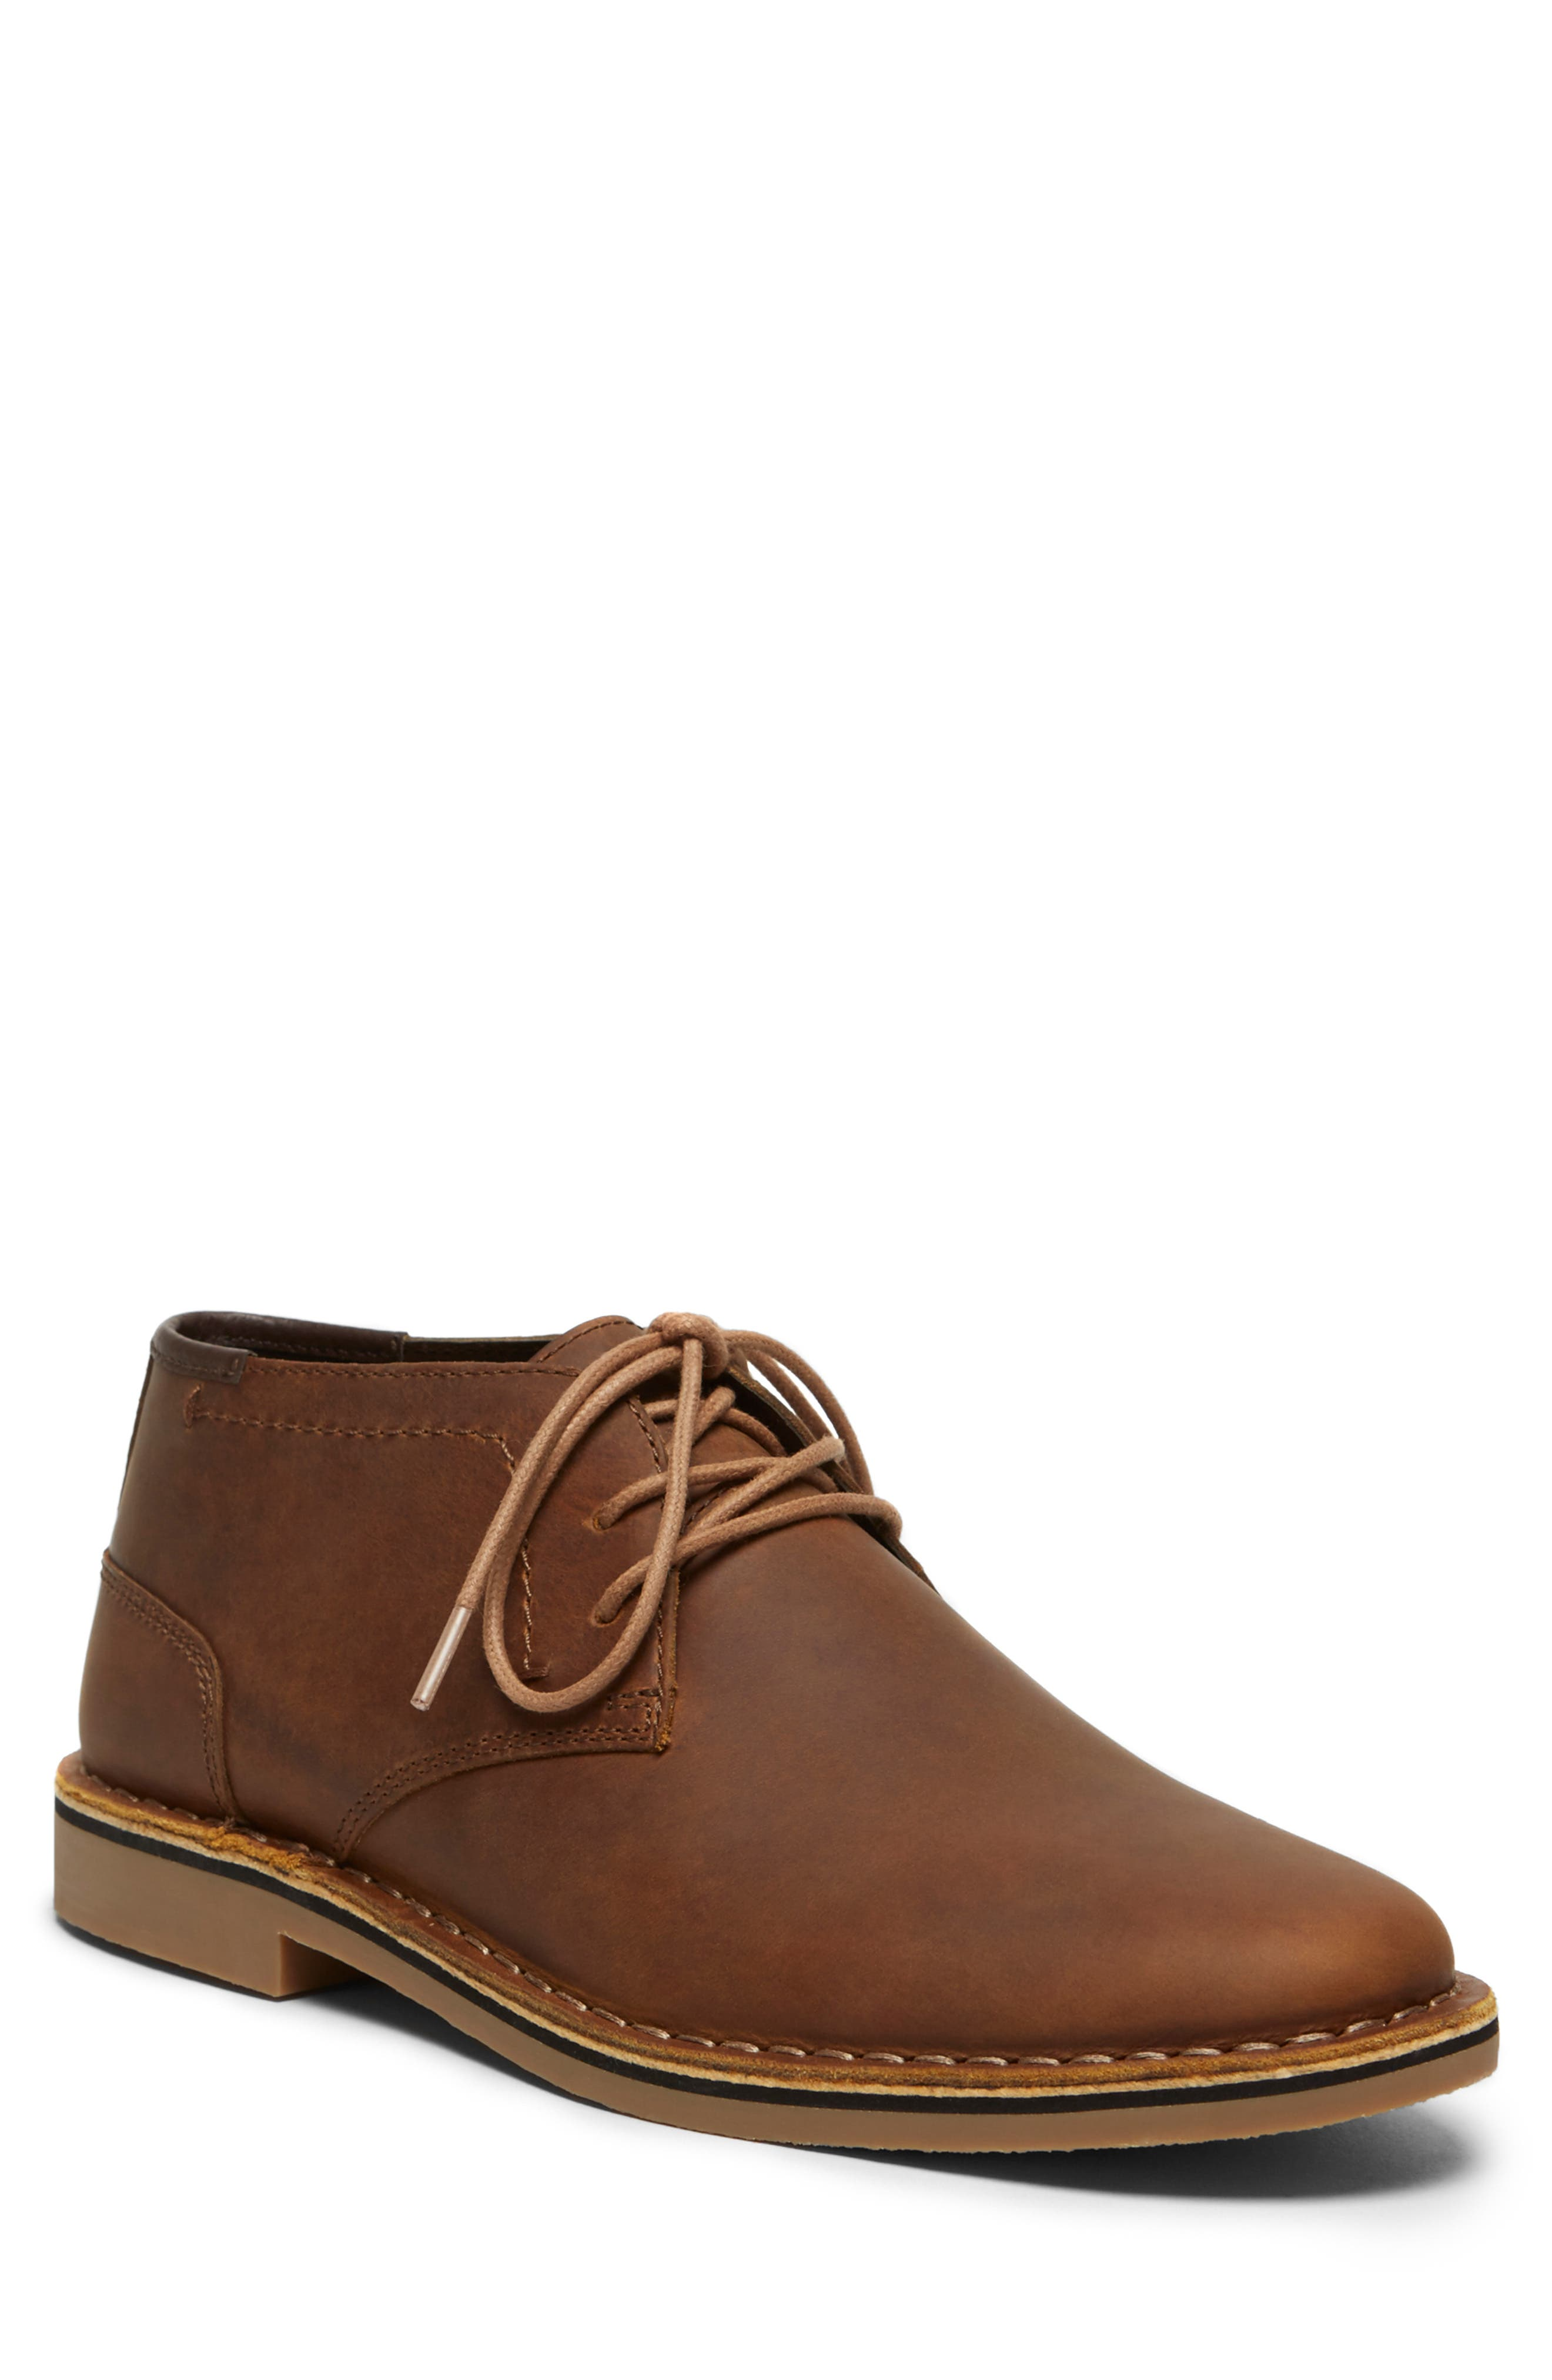 'Desert Sun' Chukka Boot,                         Main,                         color, BROWN LEATHER